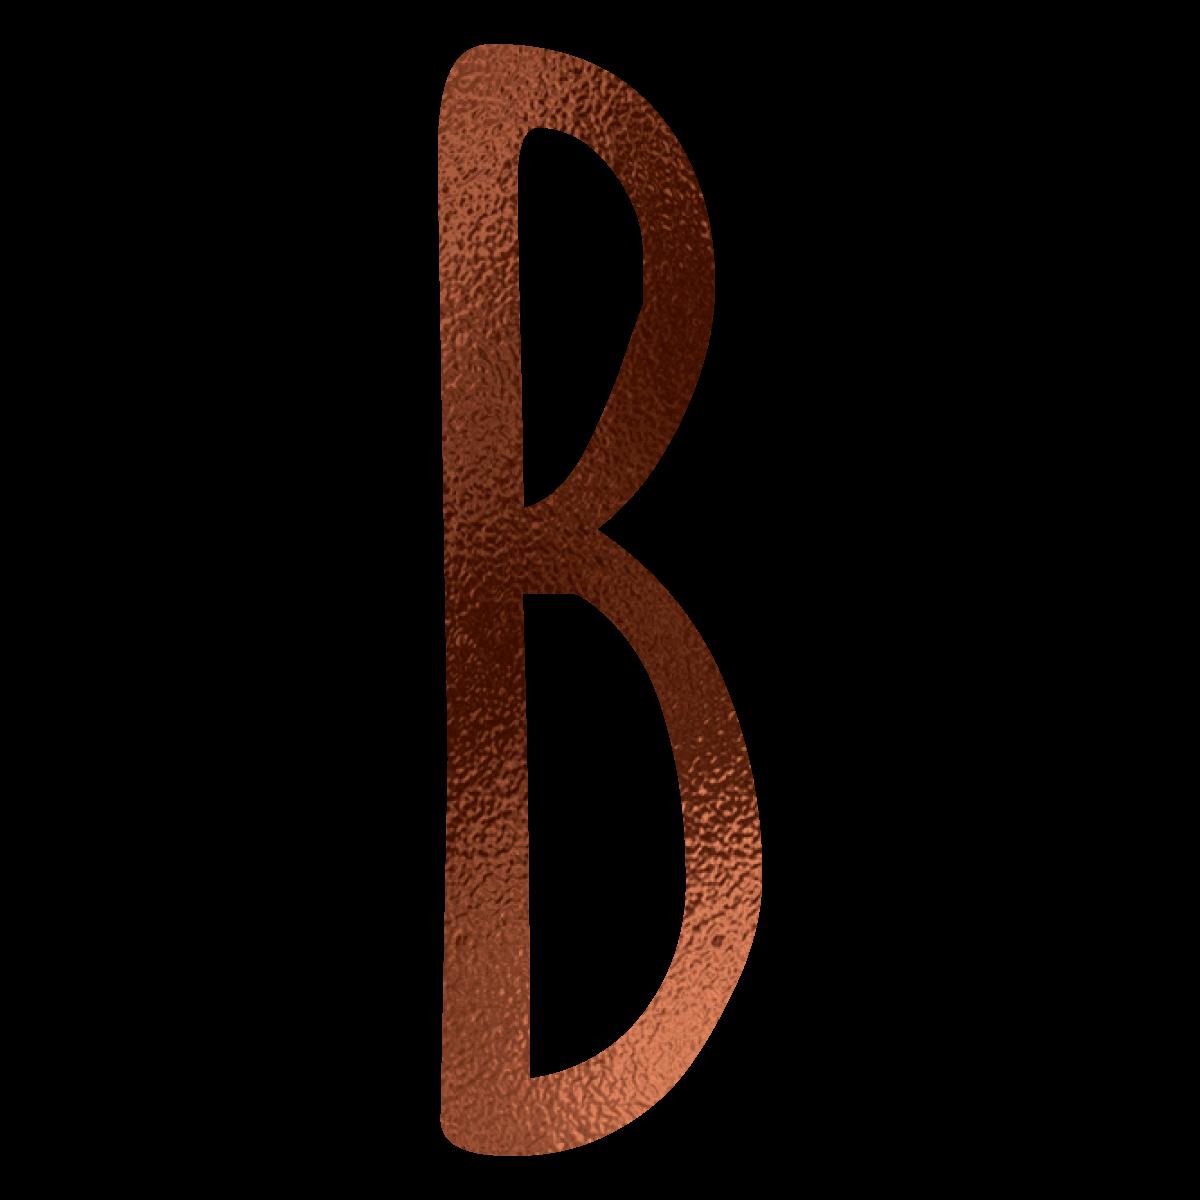 Alphabet_Am_Foil_Copper_Cap_B